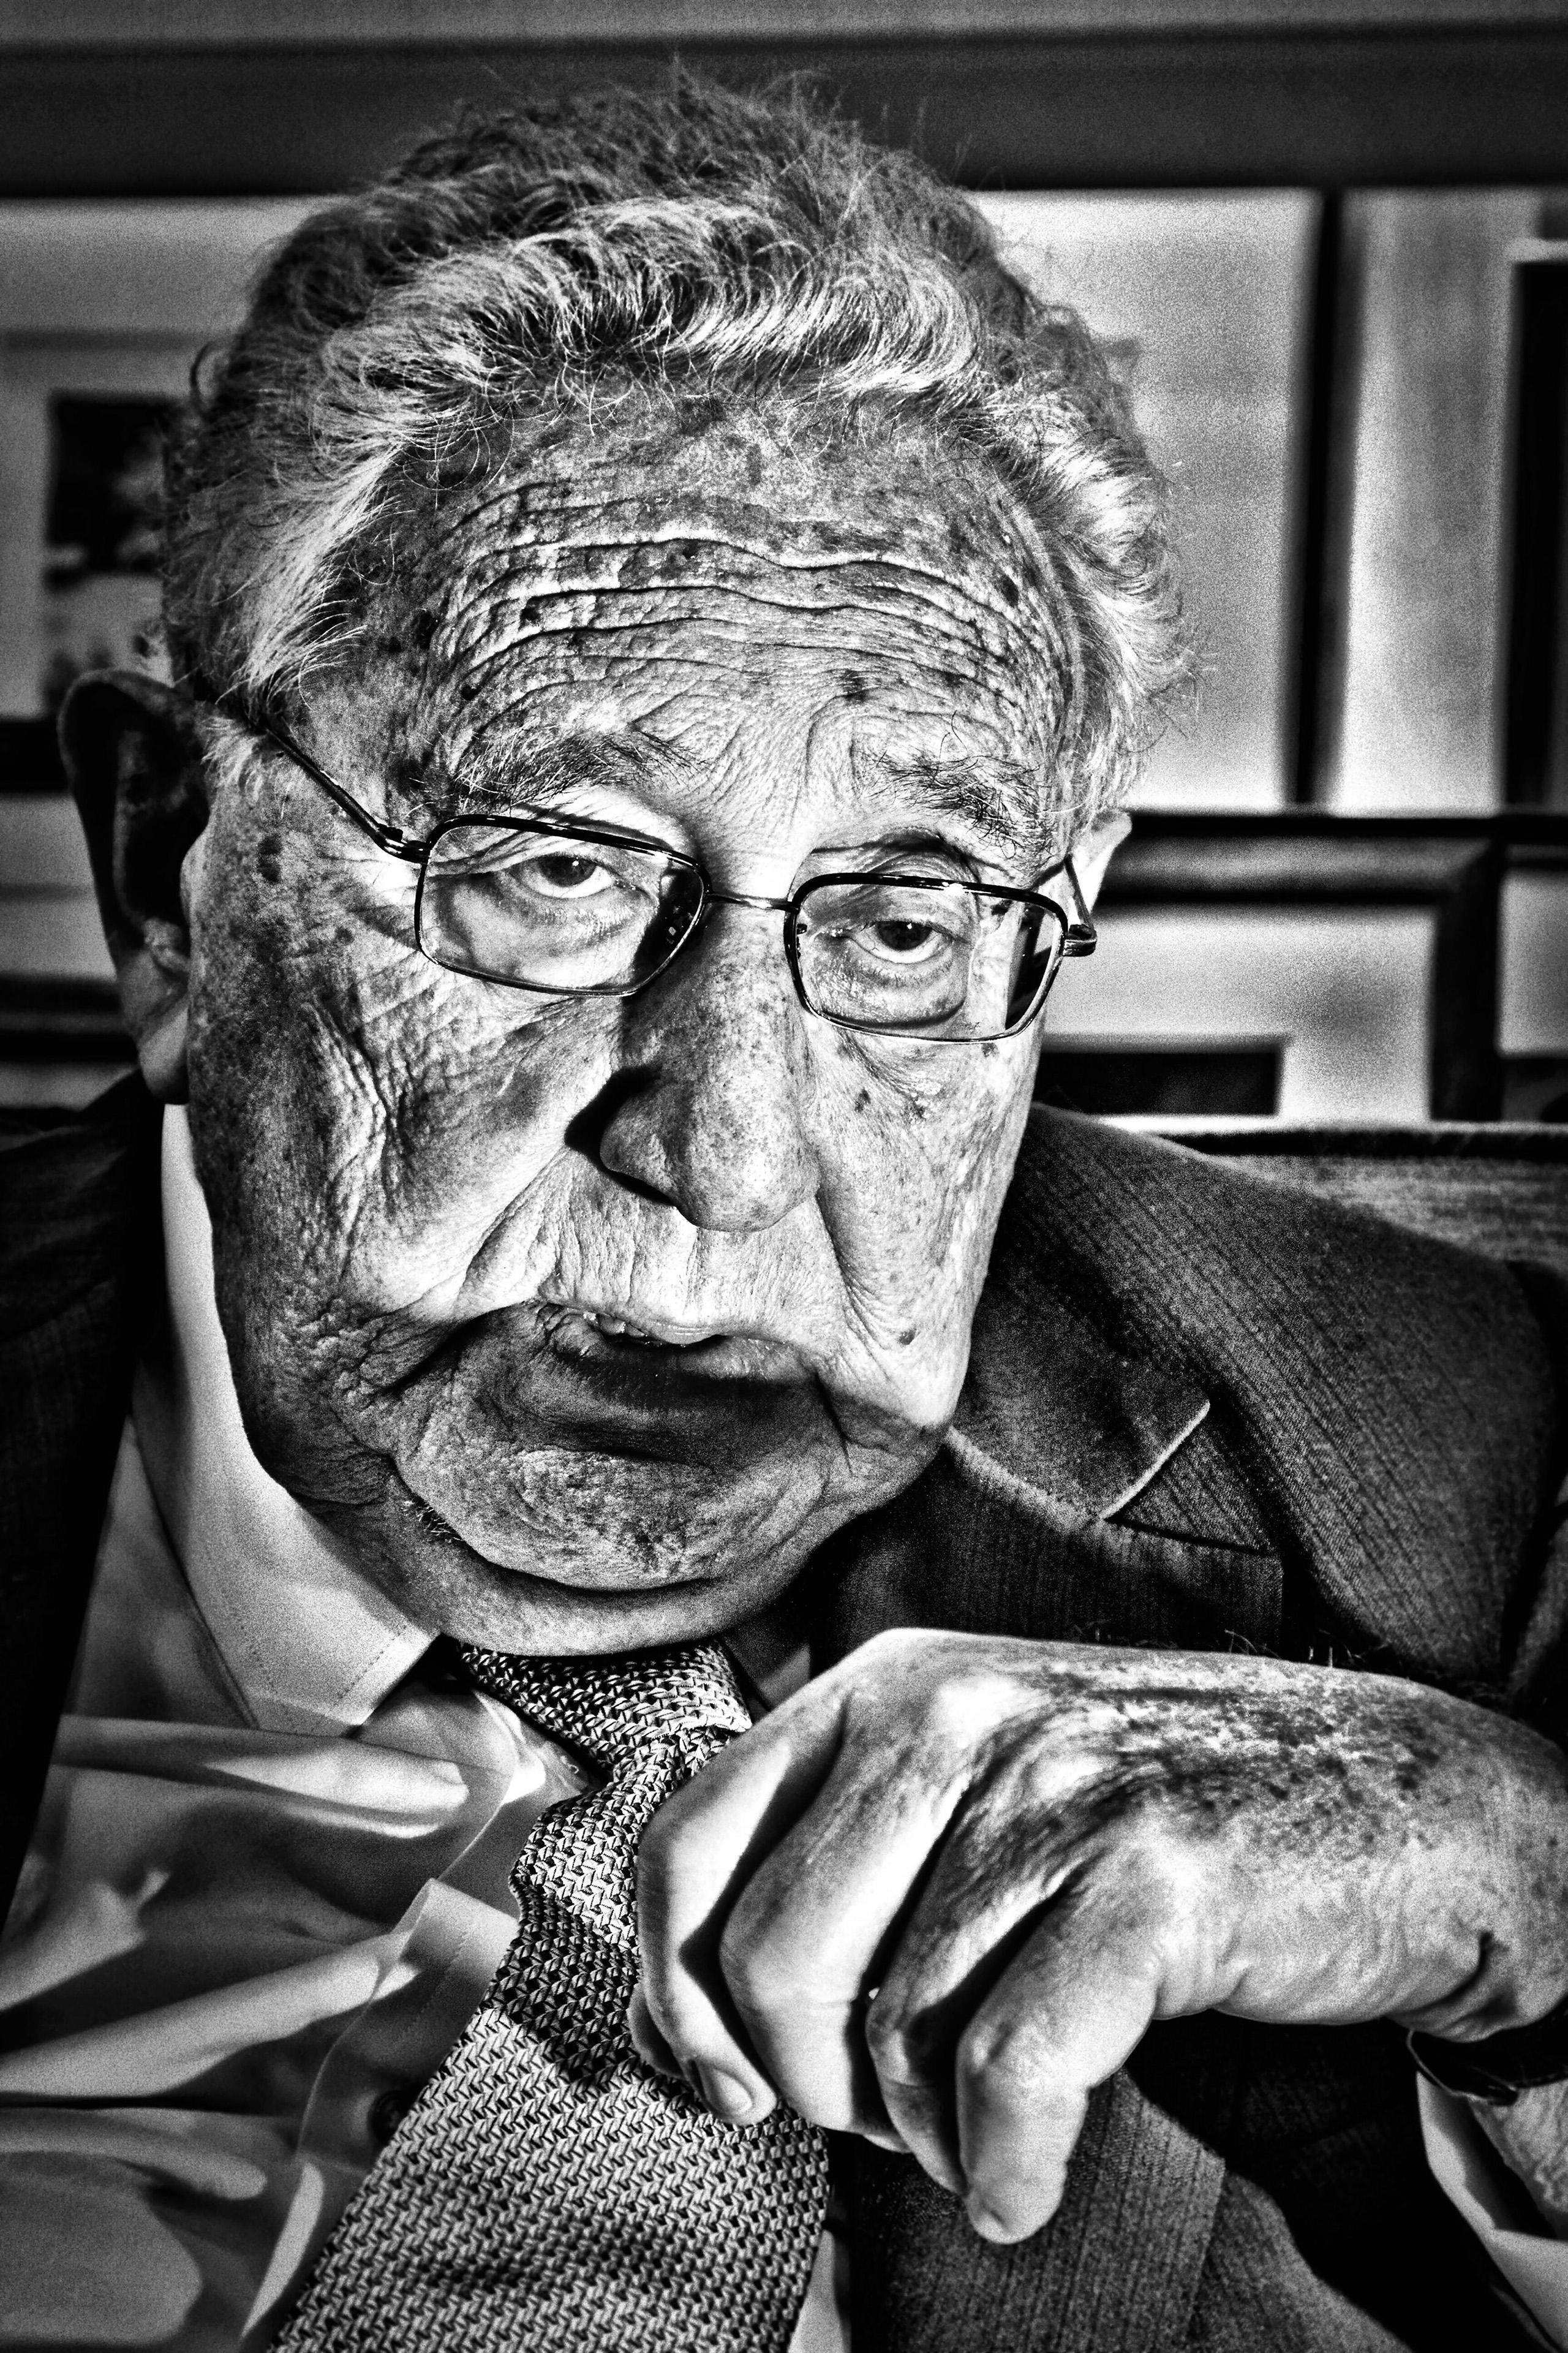 Former Secretary of State and Nobel Peace prize winner Dr. Henry Kissinger in his office at Kissinger Associates on Park Ave.